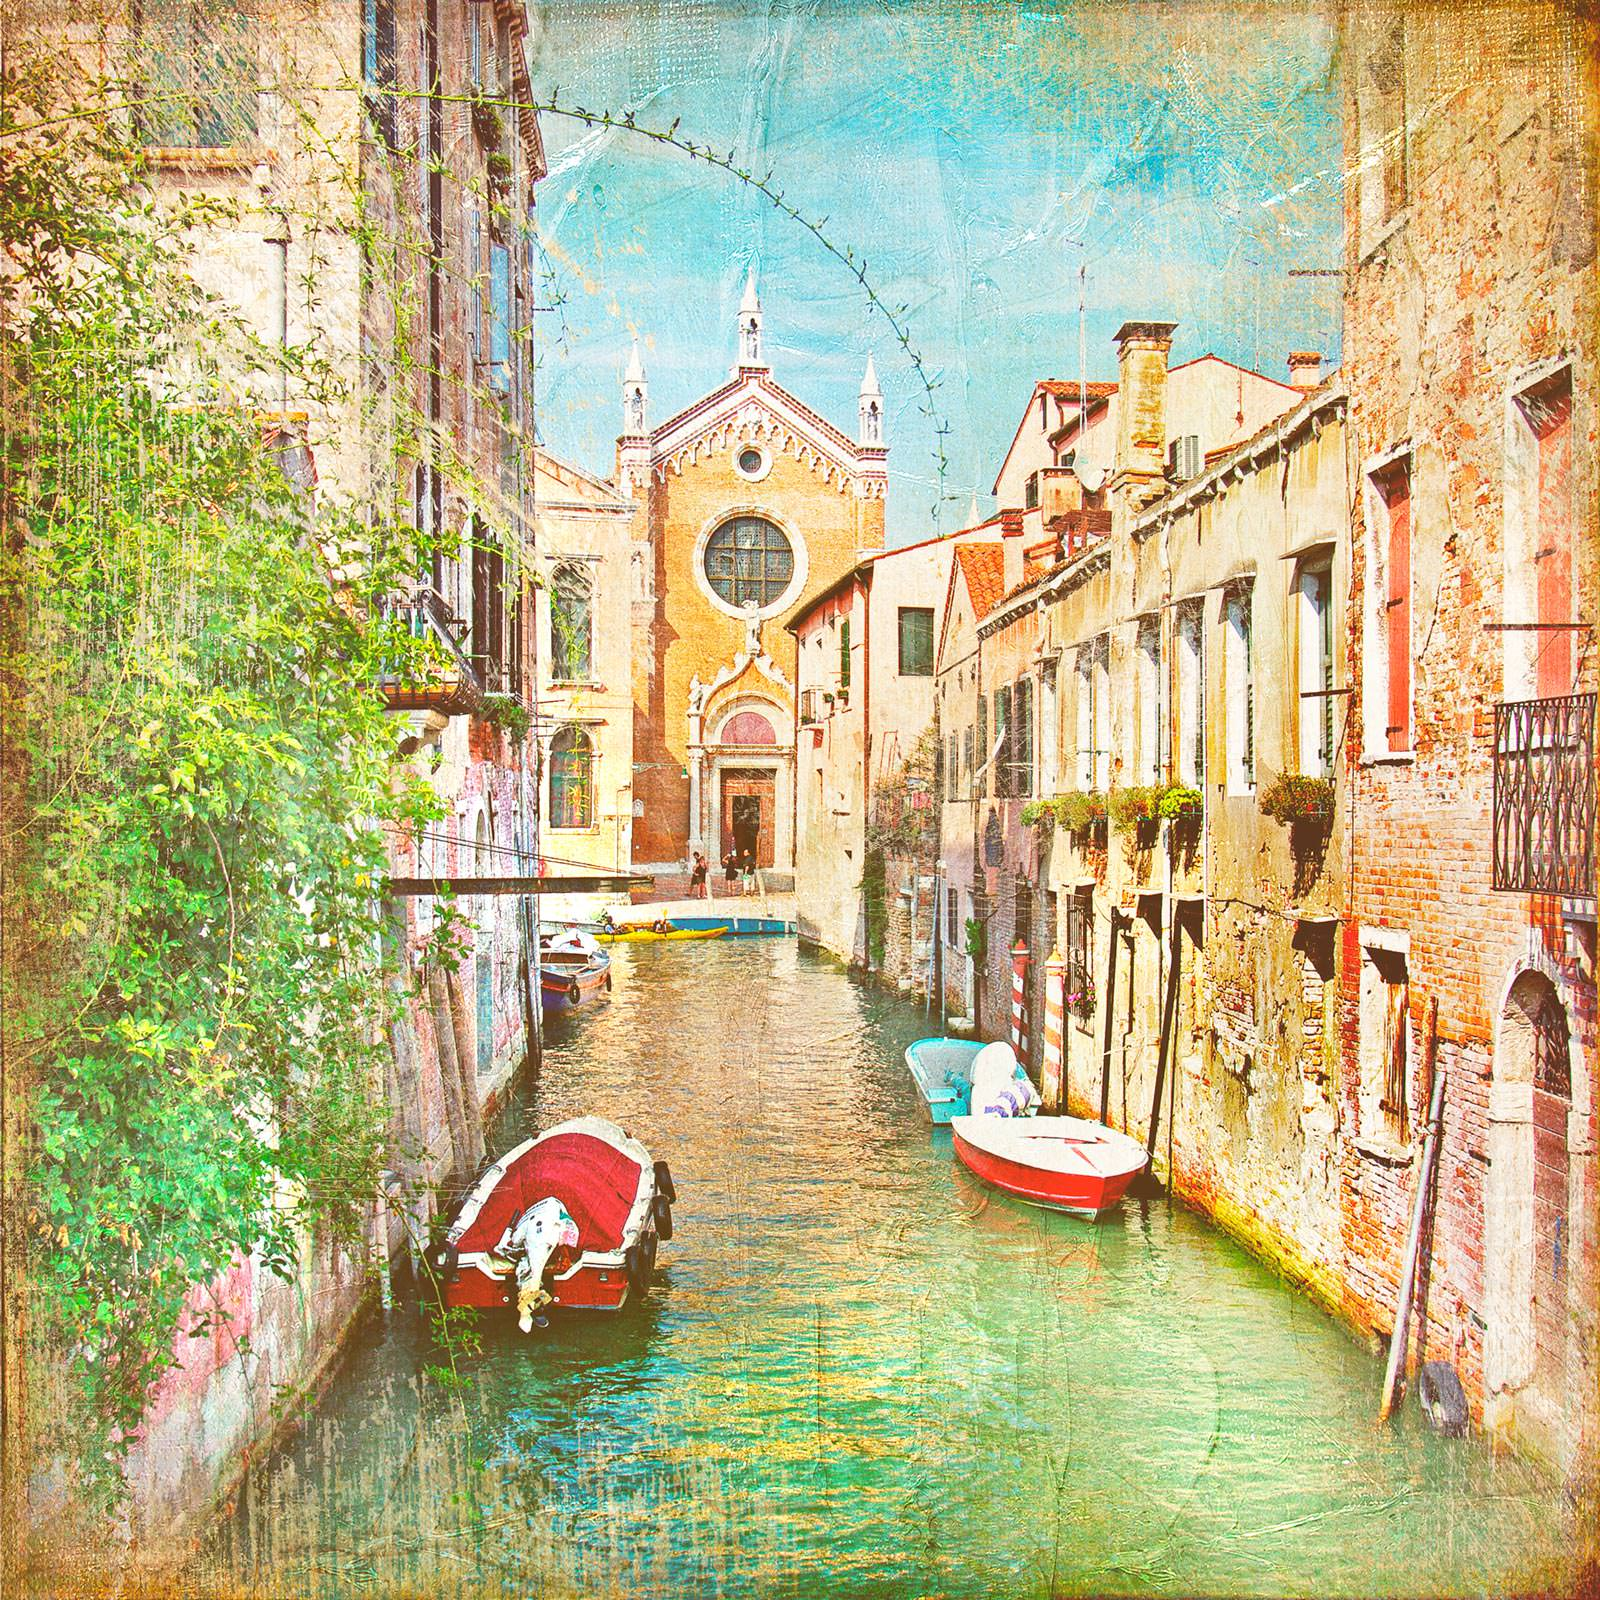 Обои кафе, канал, венеция. Города foto 13